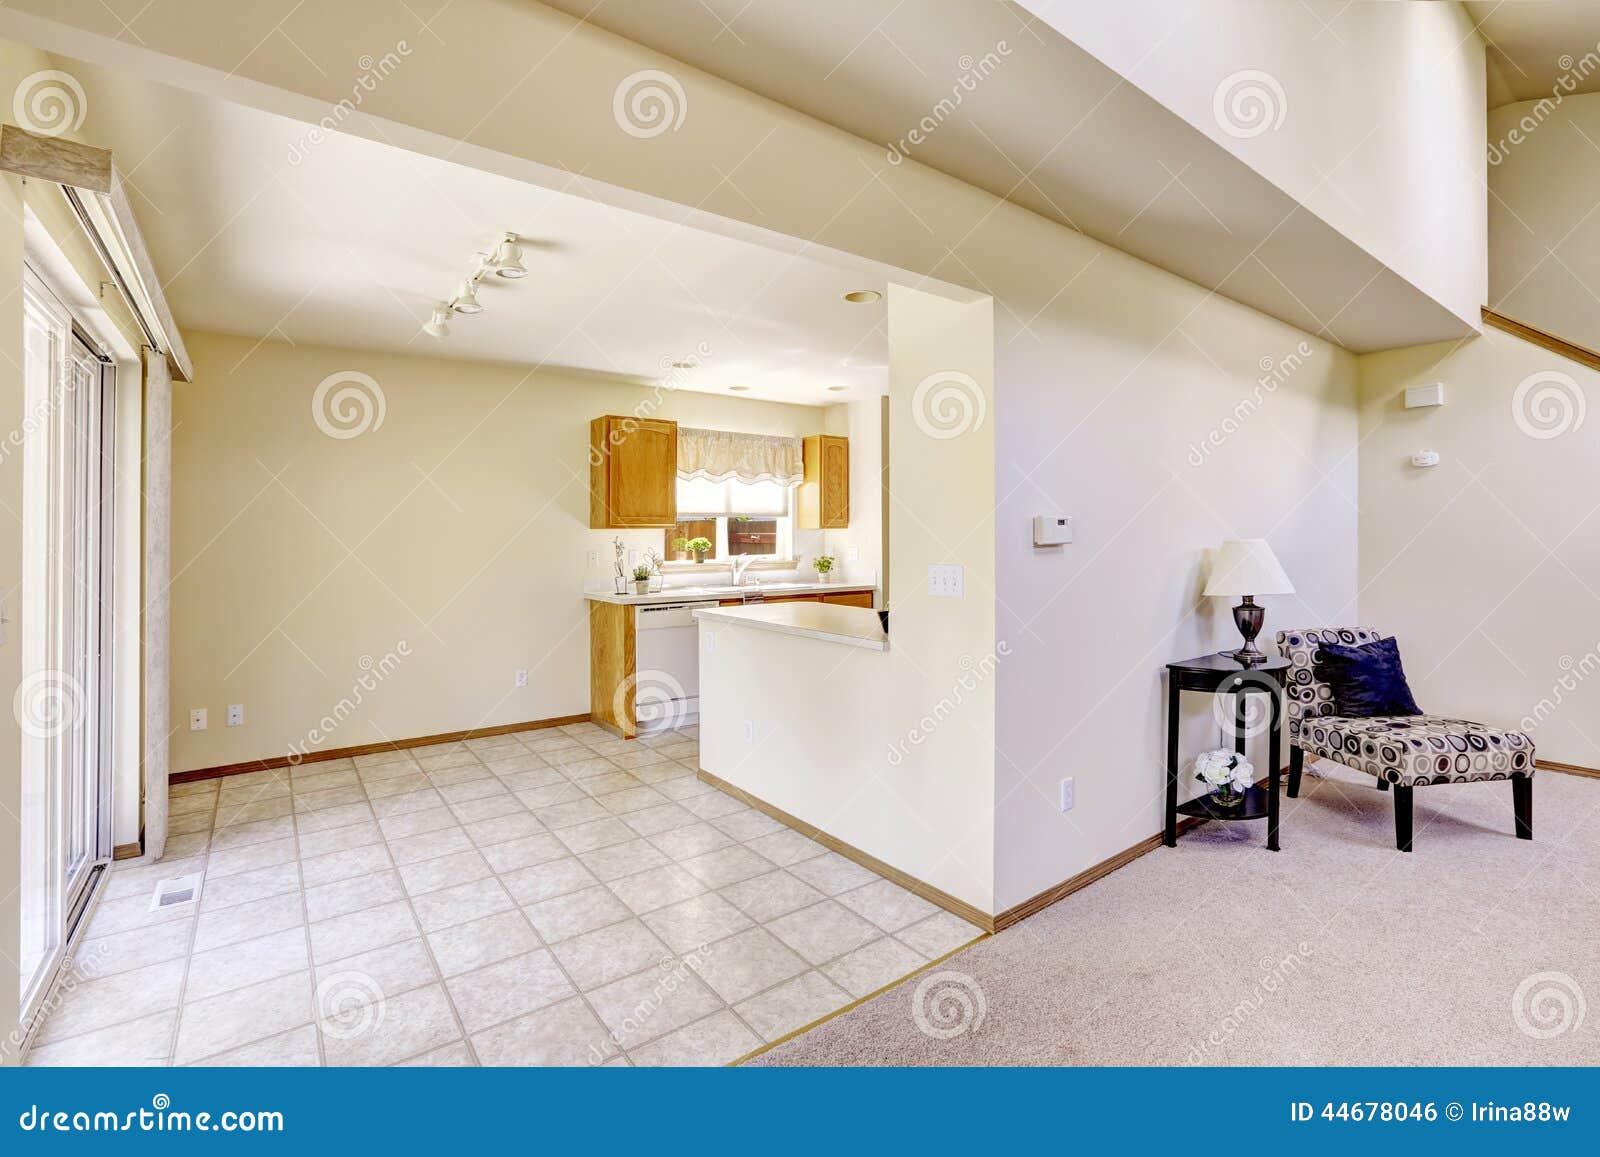 Bright rooms in empty house kitchen area with tile floor for Baldosas interior baratas